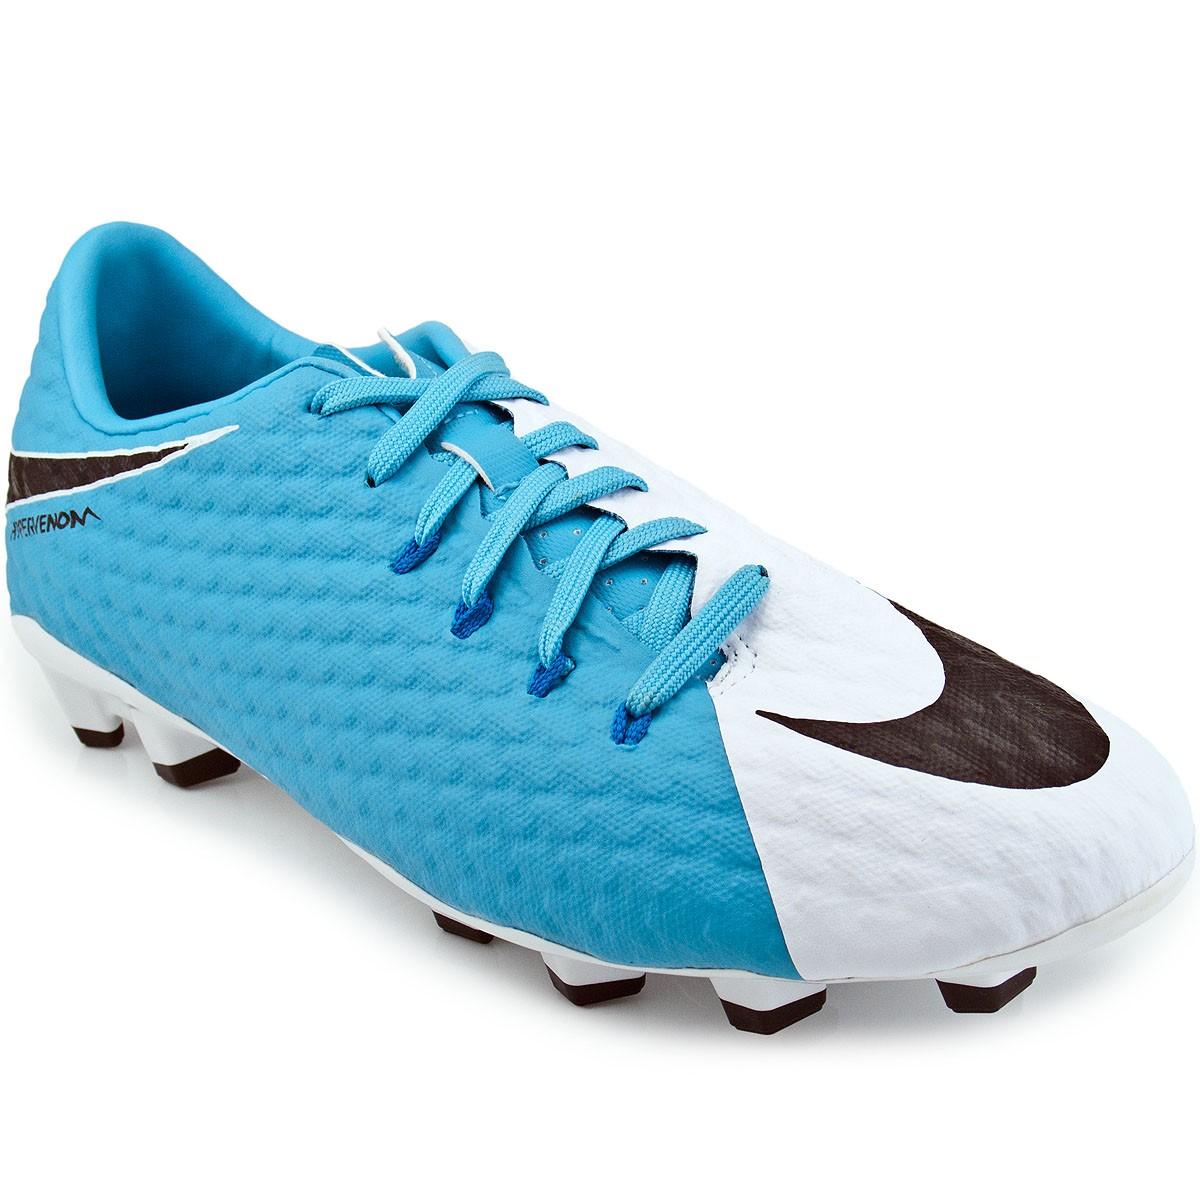 5045e296831e5 Chuteira Nike Hypervenom Phelon III FG